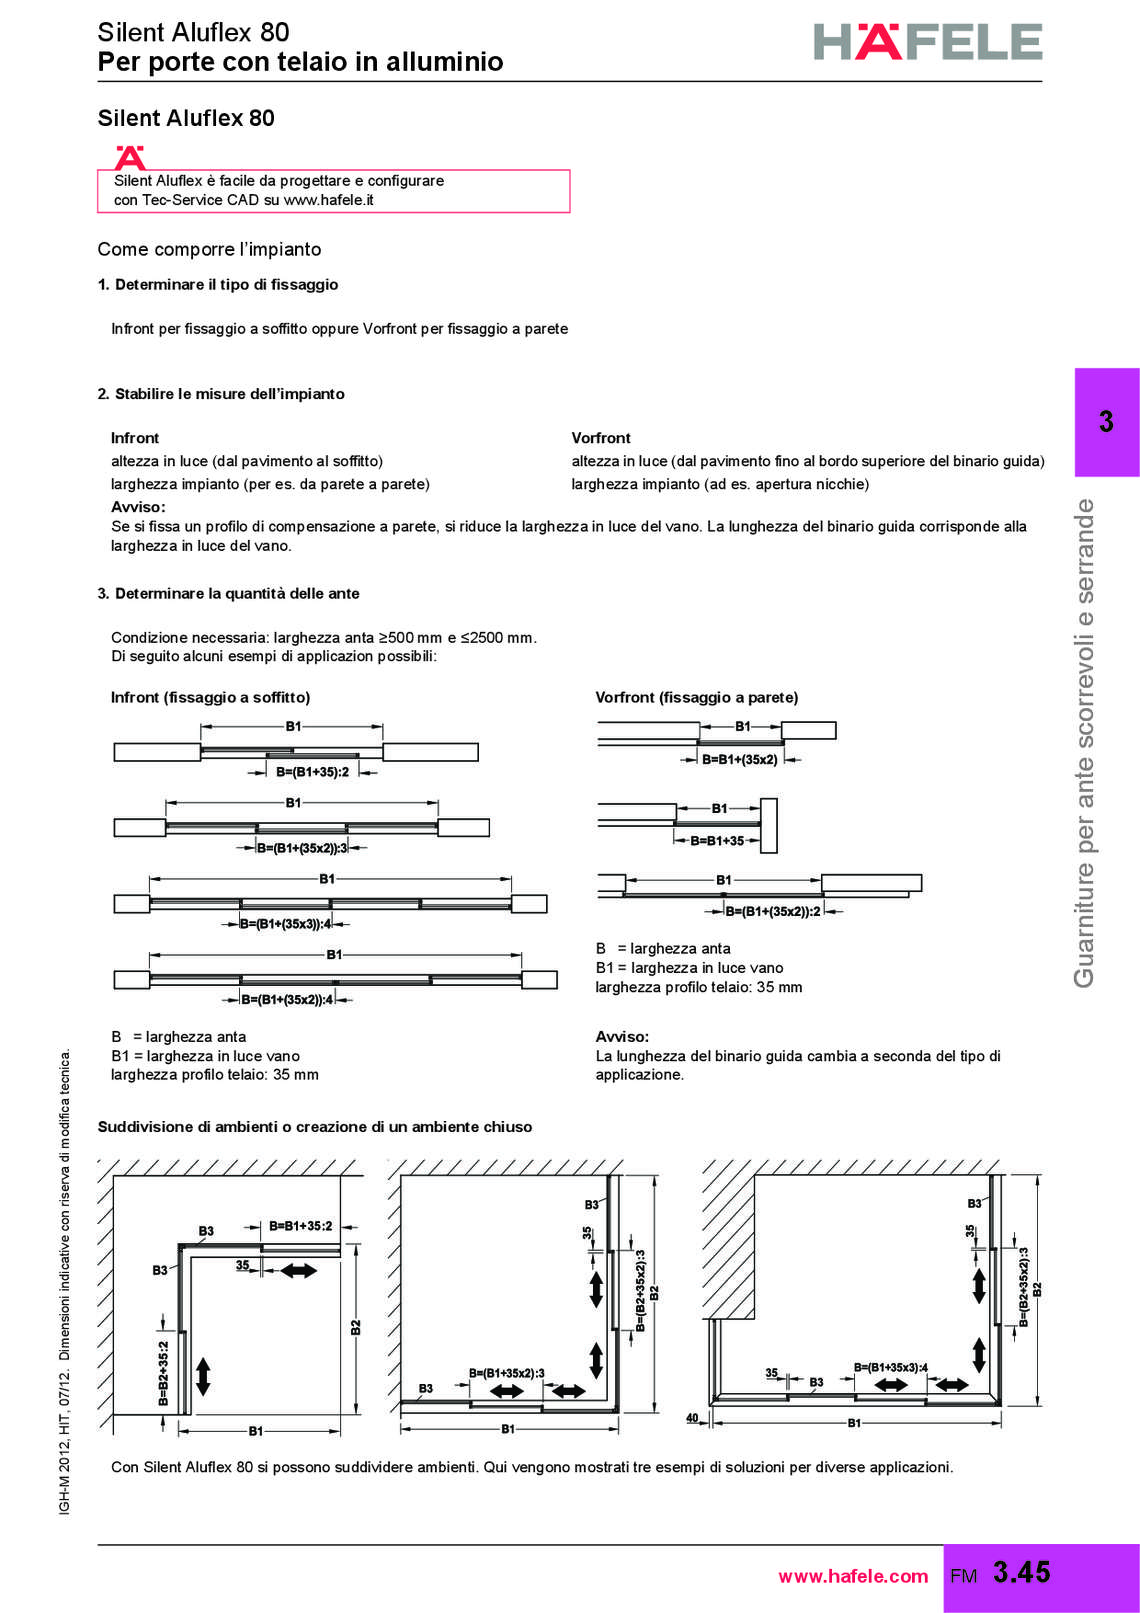 hafele-prodotti-su-misura_81_058.jpg